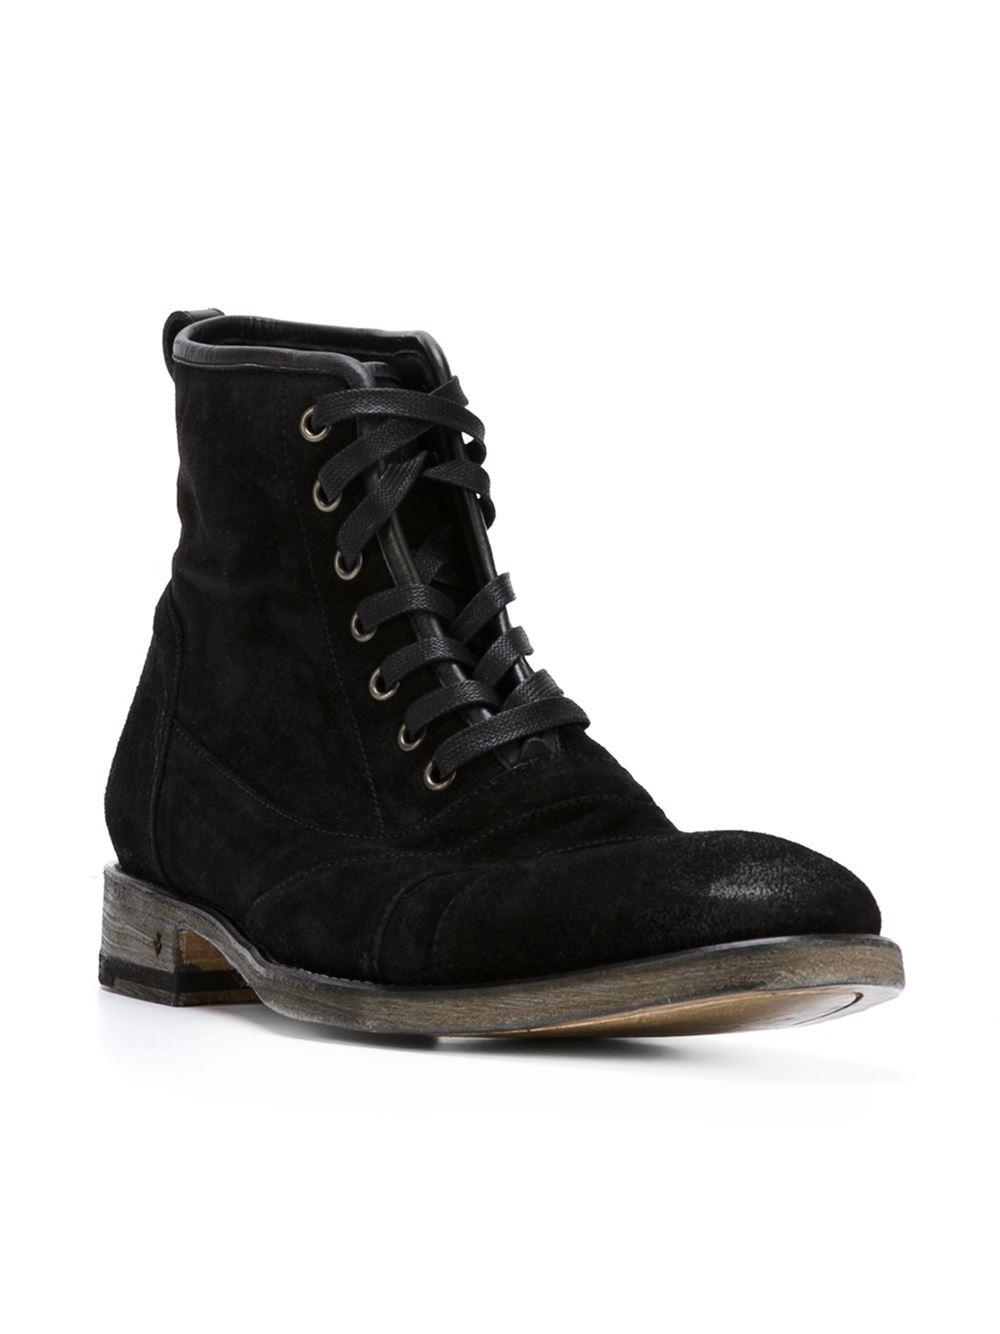 John varvatos Utility Boots in Black for Men | Lyst